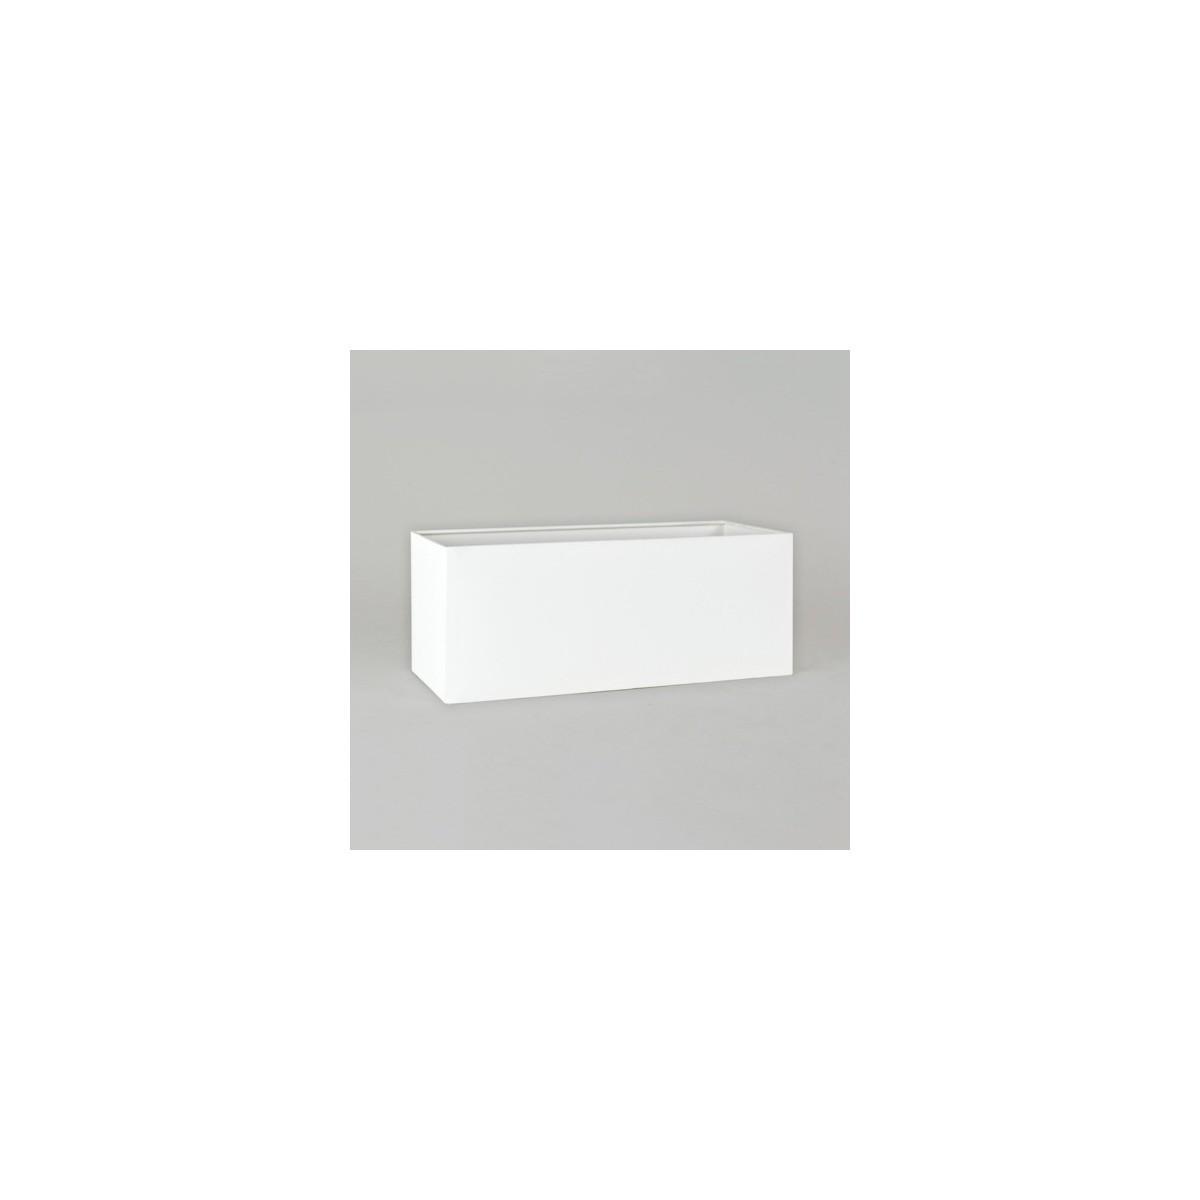 Astro Park Lane Twin Shade Abażur Biały 5001014